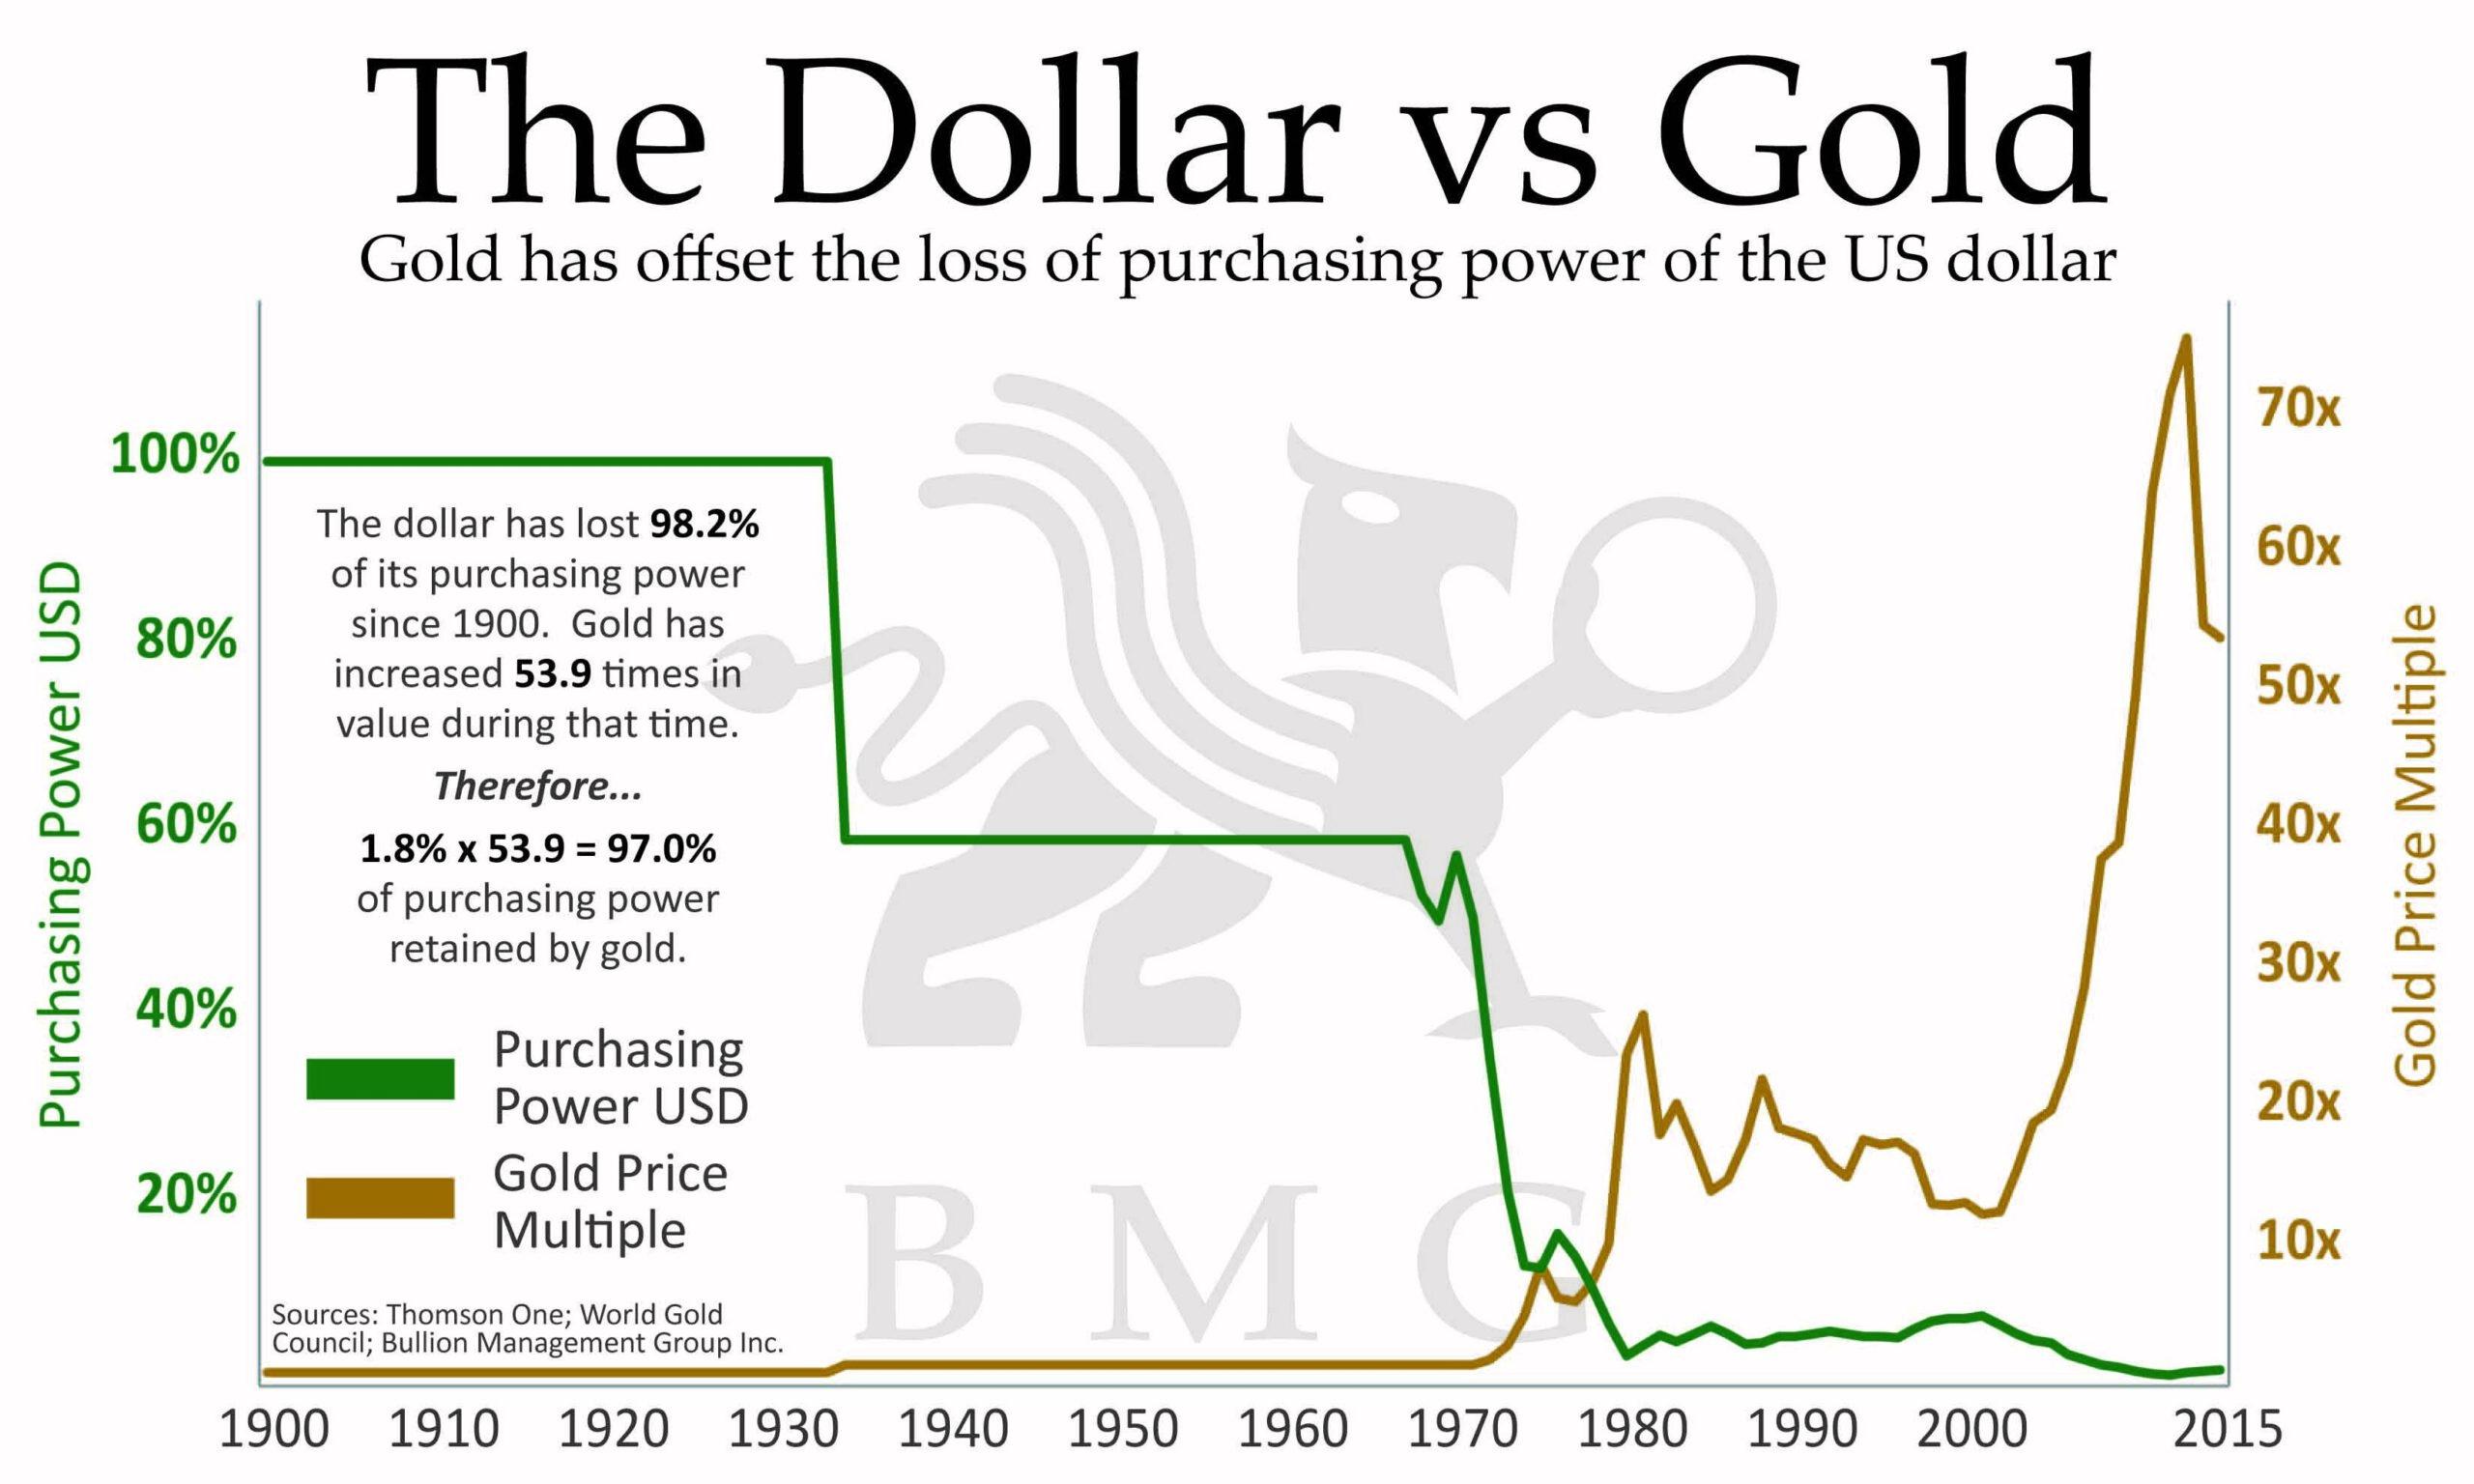 DOLLAR-VS-GOLD عن خسارة الدولار 98% من قدرته الشرائية وارتفاع الذهب 53 مرة منذ 1900 إلى الآن